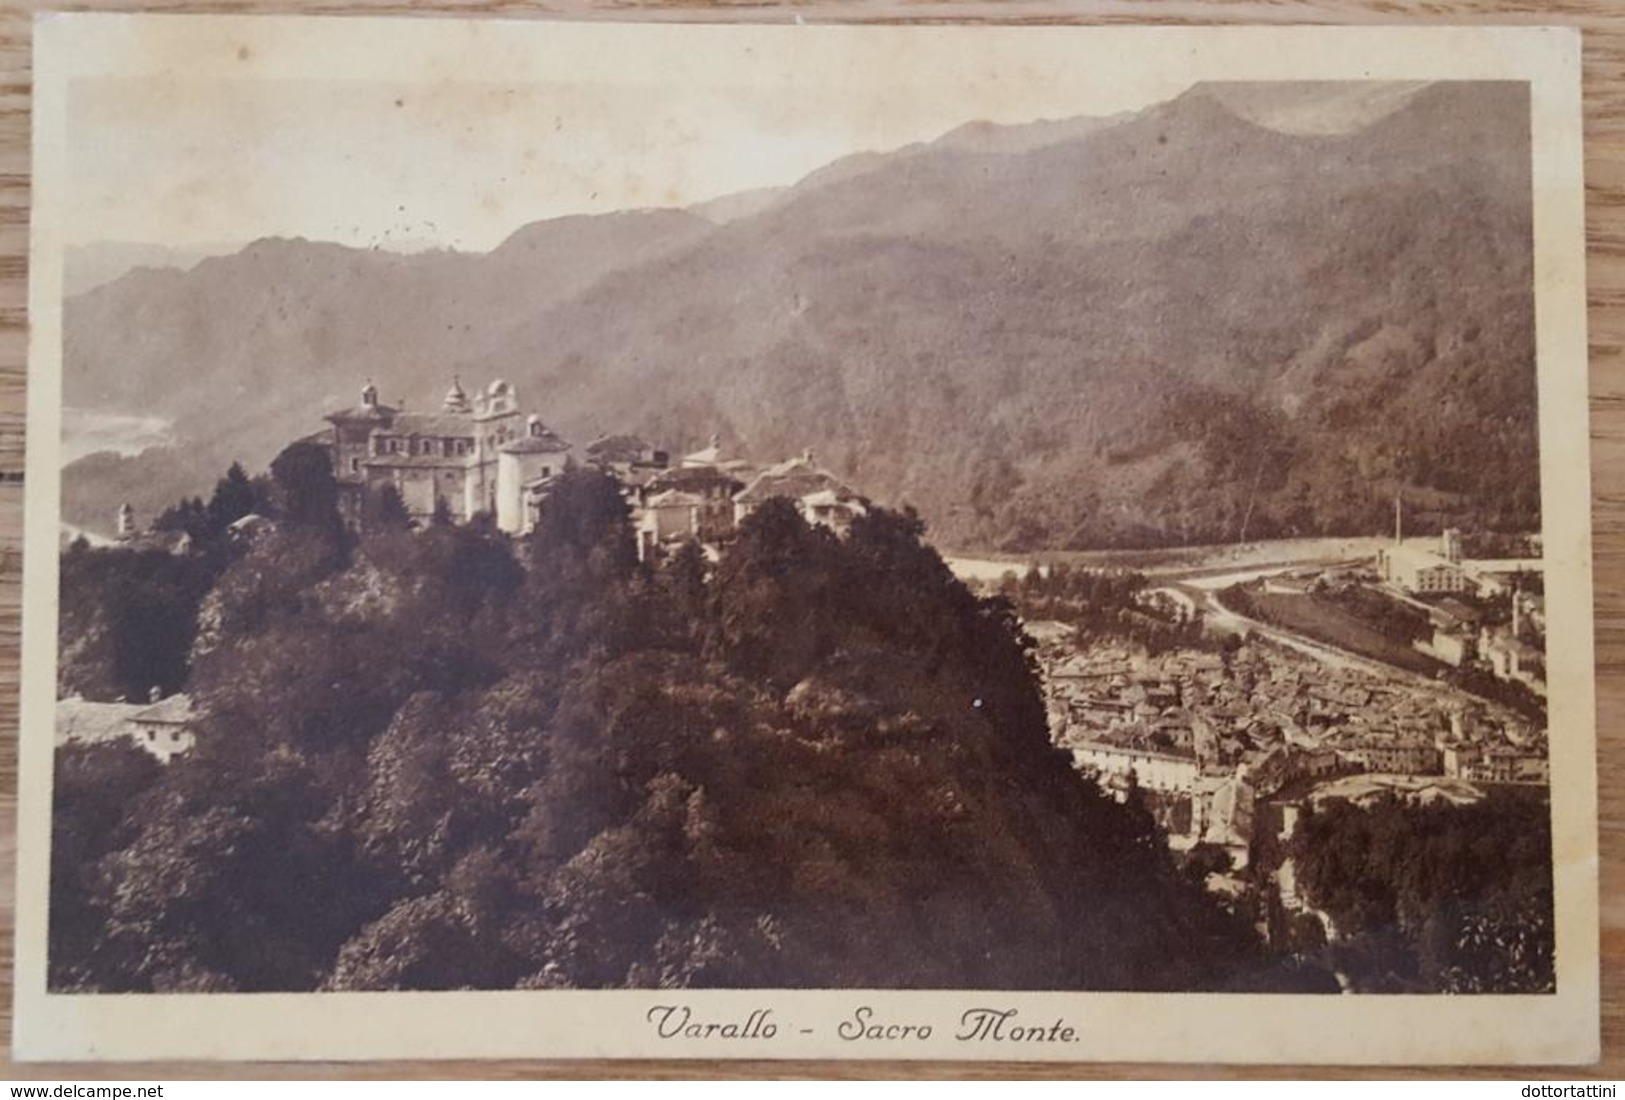 VARALLO (Vercelli) - Sacro Monte (Unesco Heritage) - Vg 1935 - Vercelli